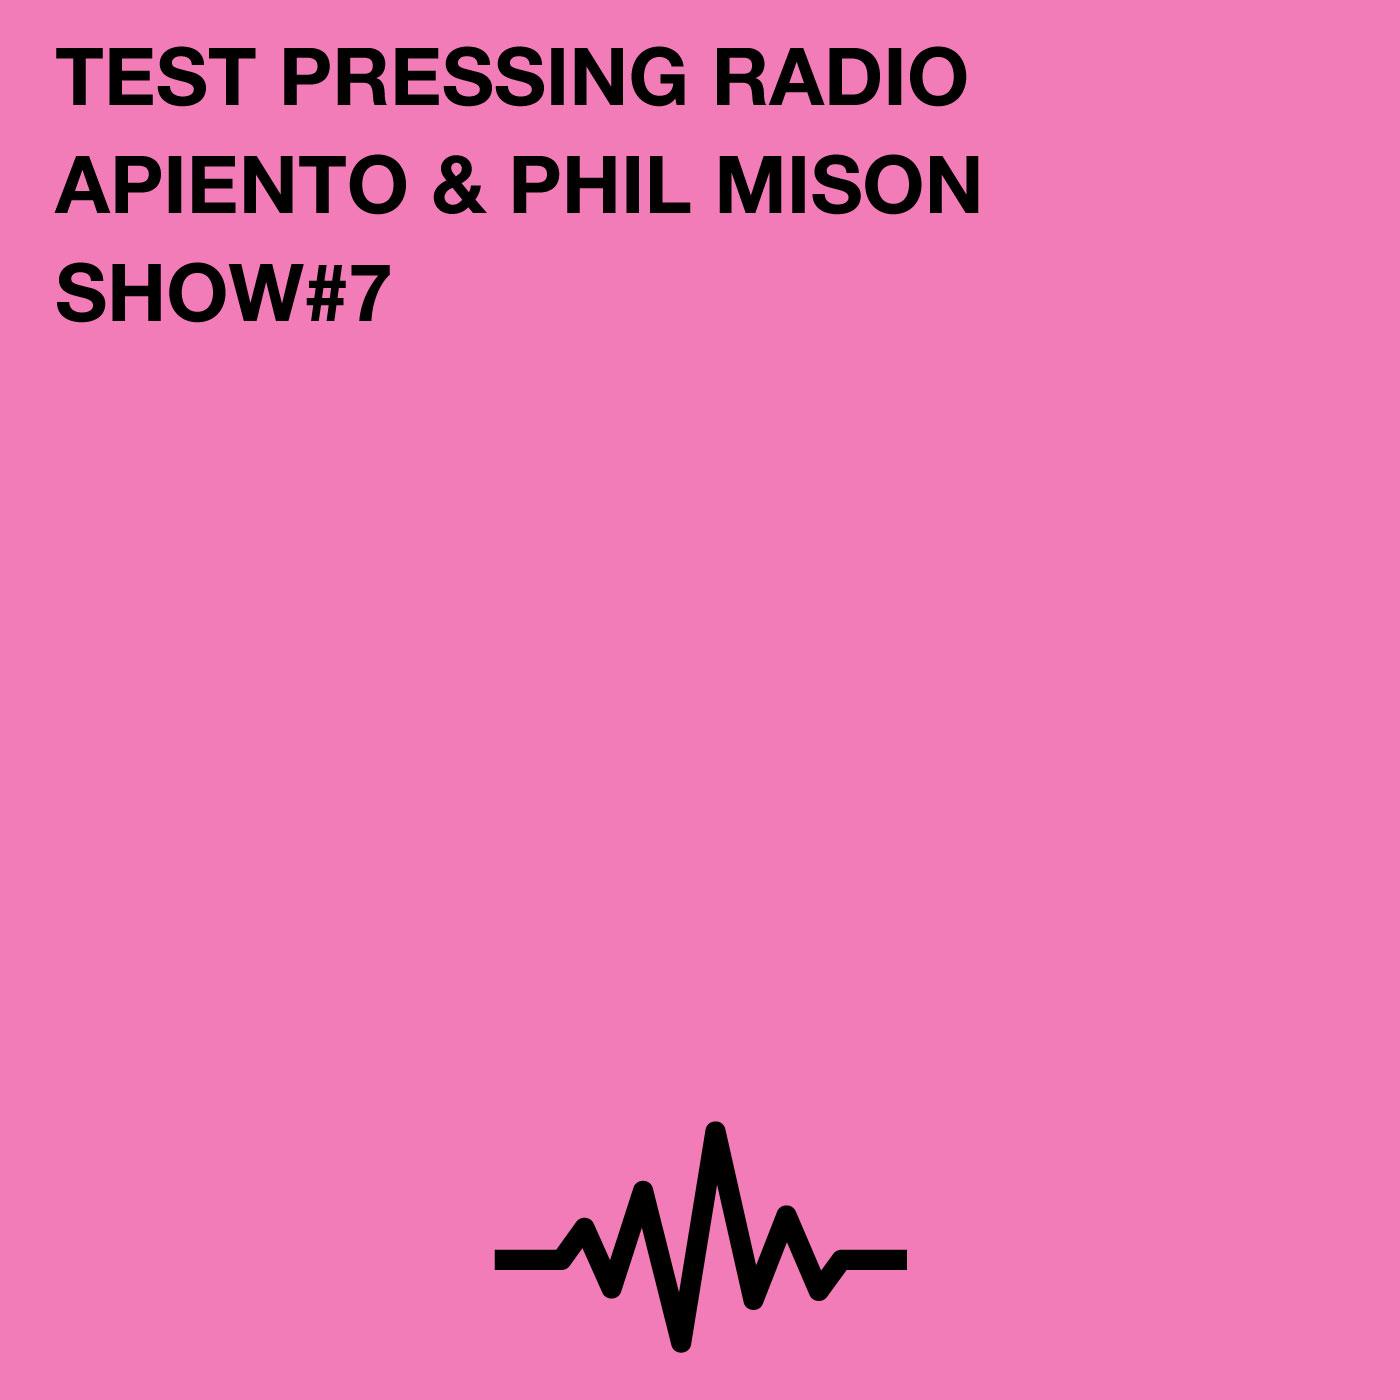 Test Pressing, Podcast, Radio, Phil Mison, Apiento, Paul Byrne